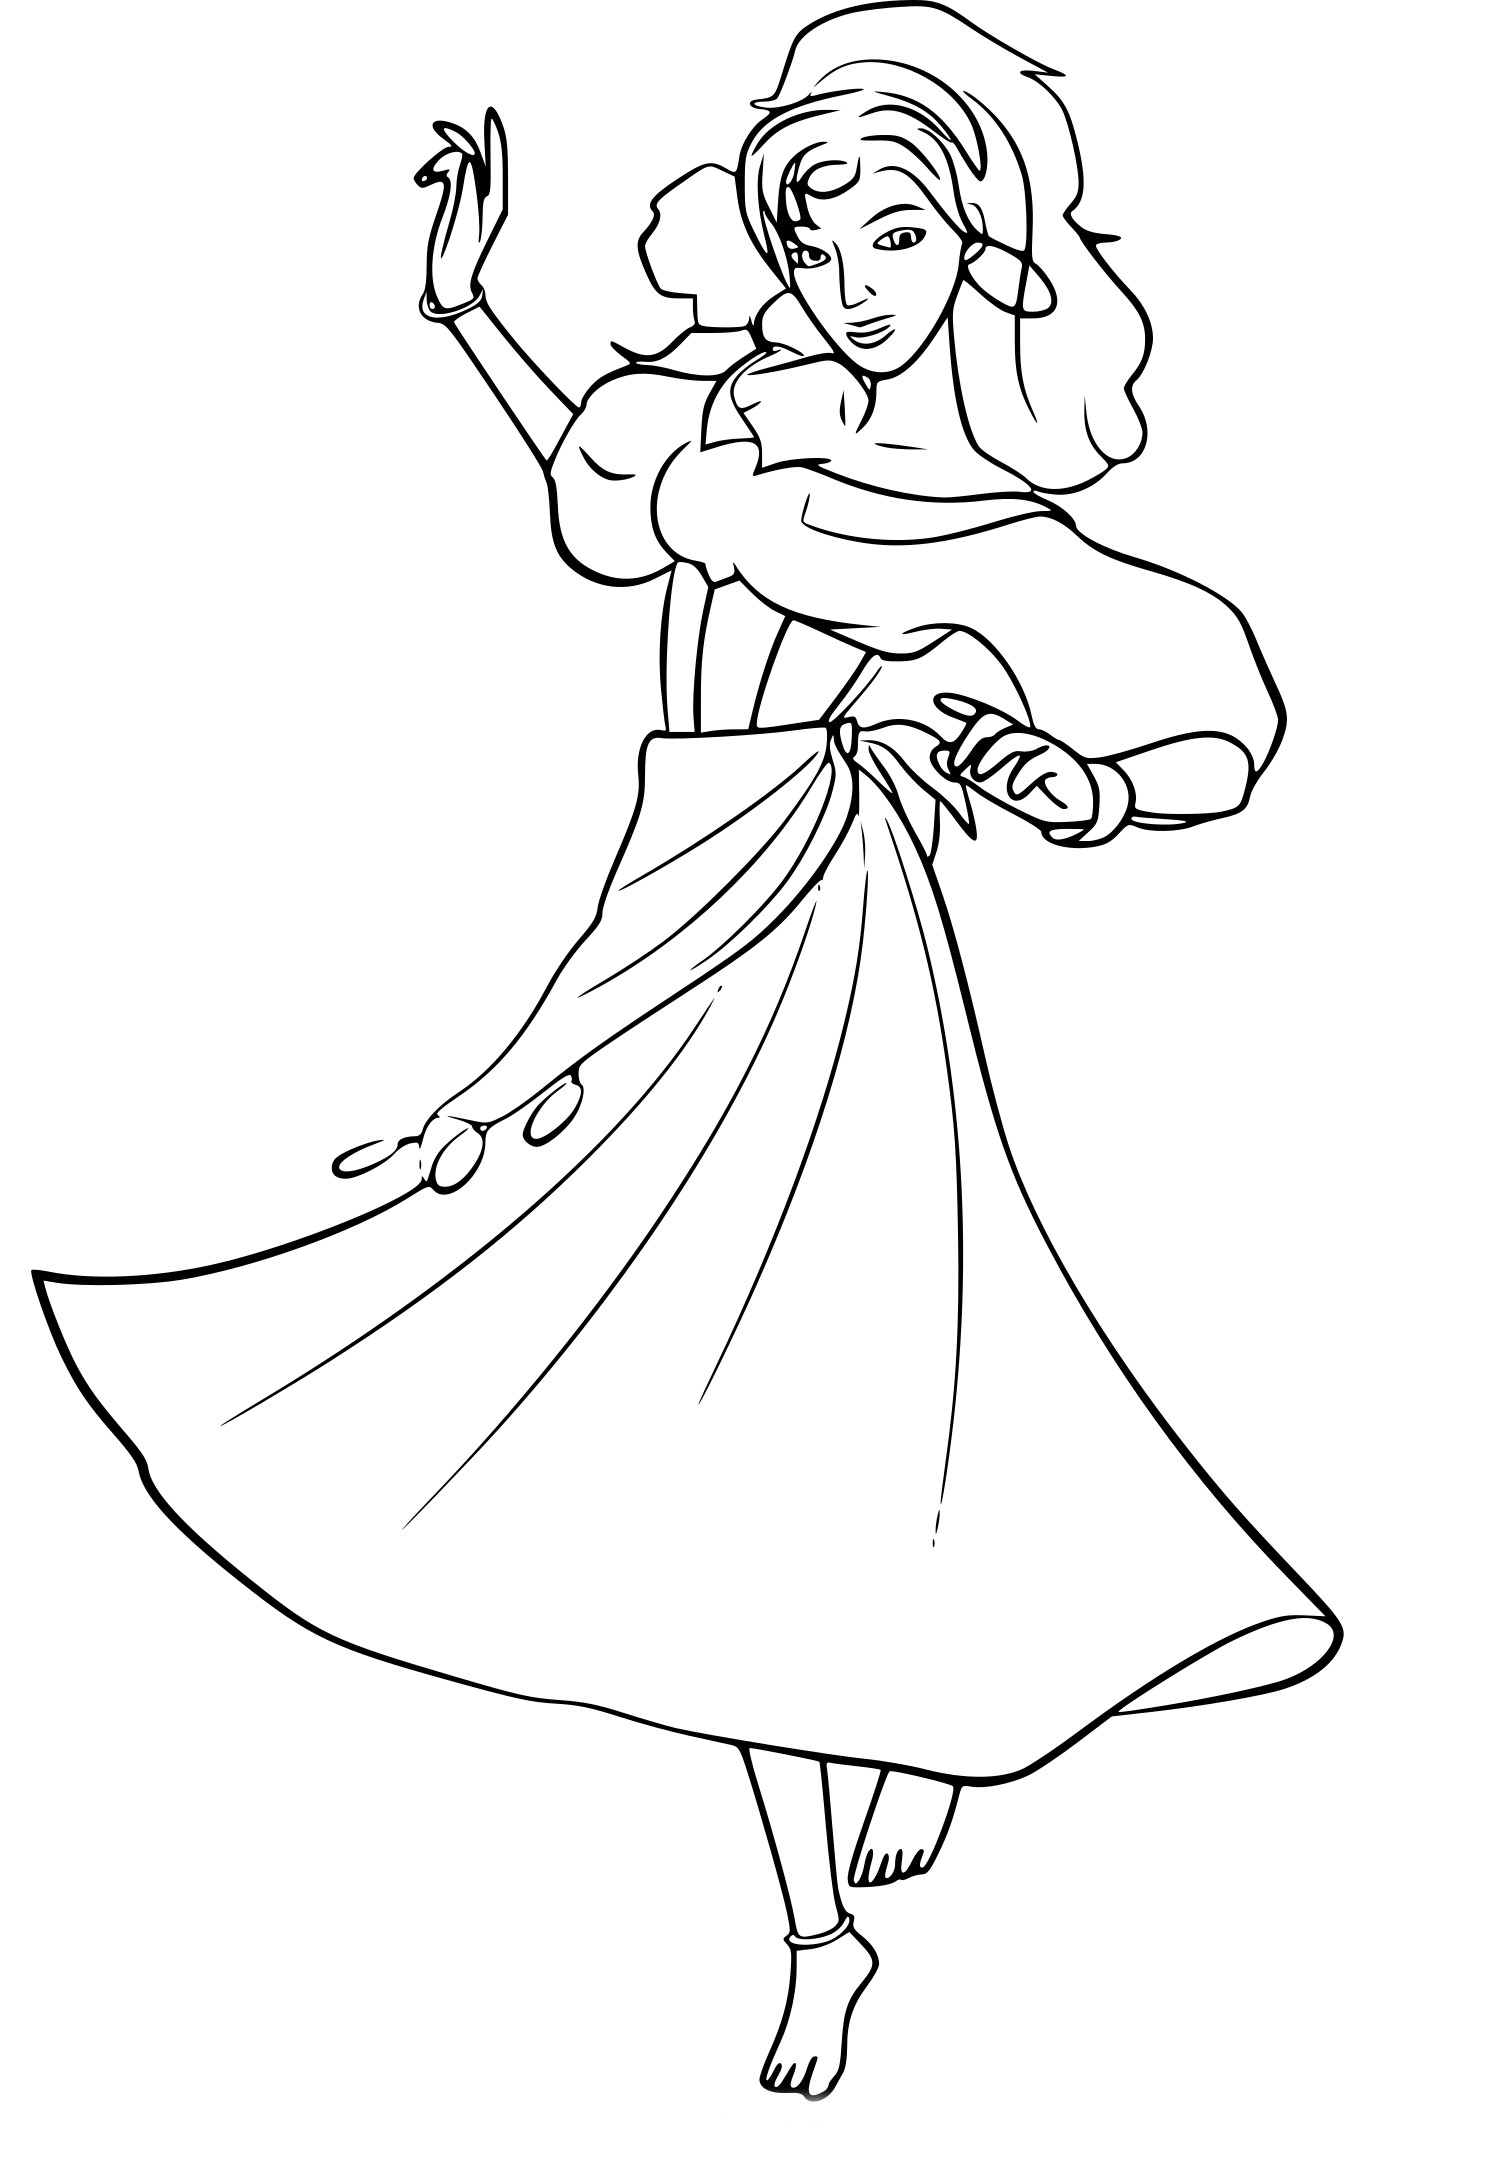 Coloriage Esmeralda À Imprimer avec Dessin Imprimer